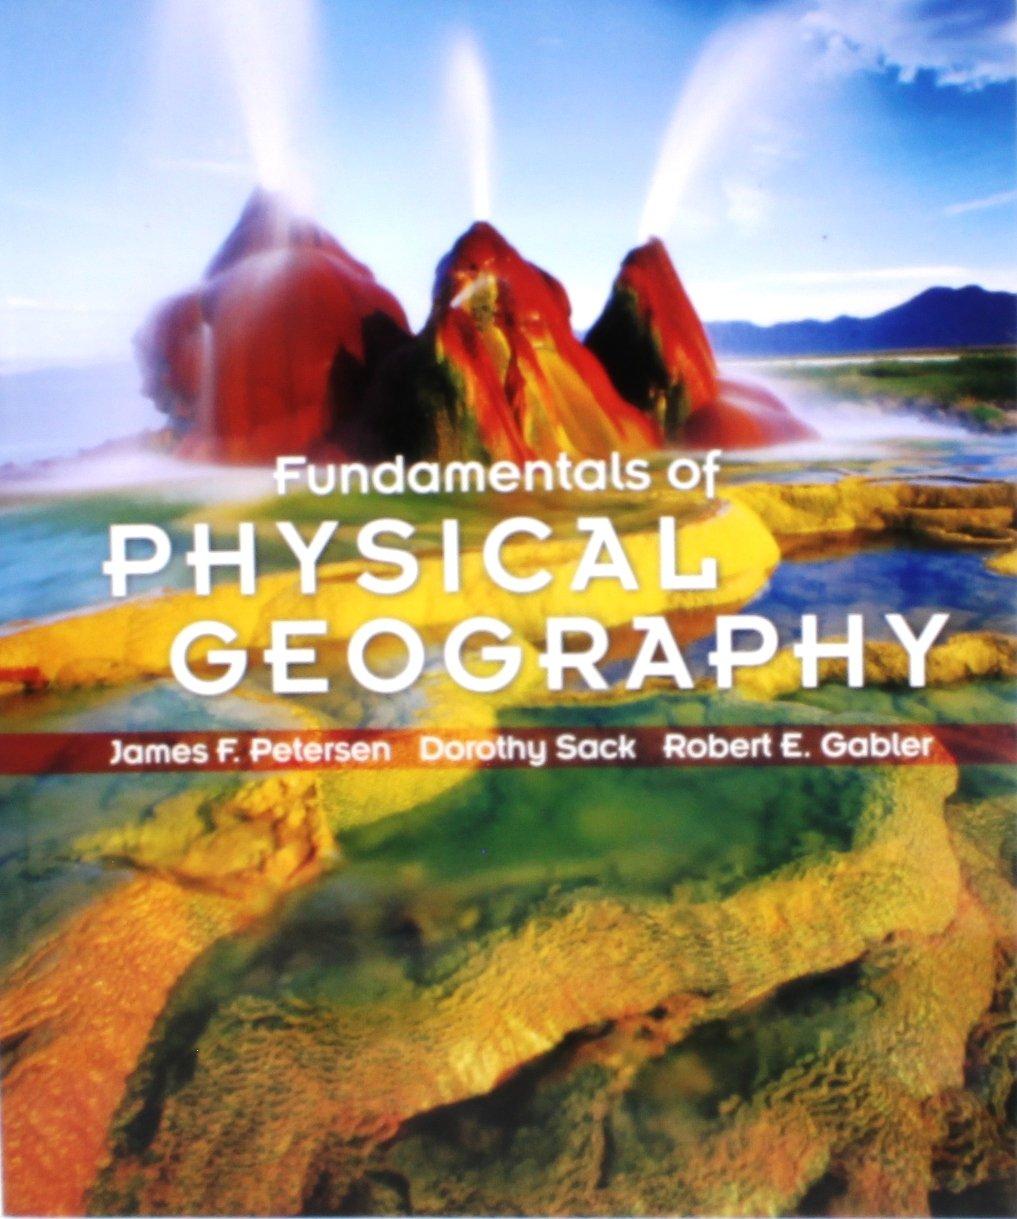 Fundamentals of Physical Geography: James F. Petersen, Dorothy Sack, Robert  E. Gabler: 9780538735933: Amazon.com: Books